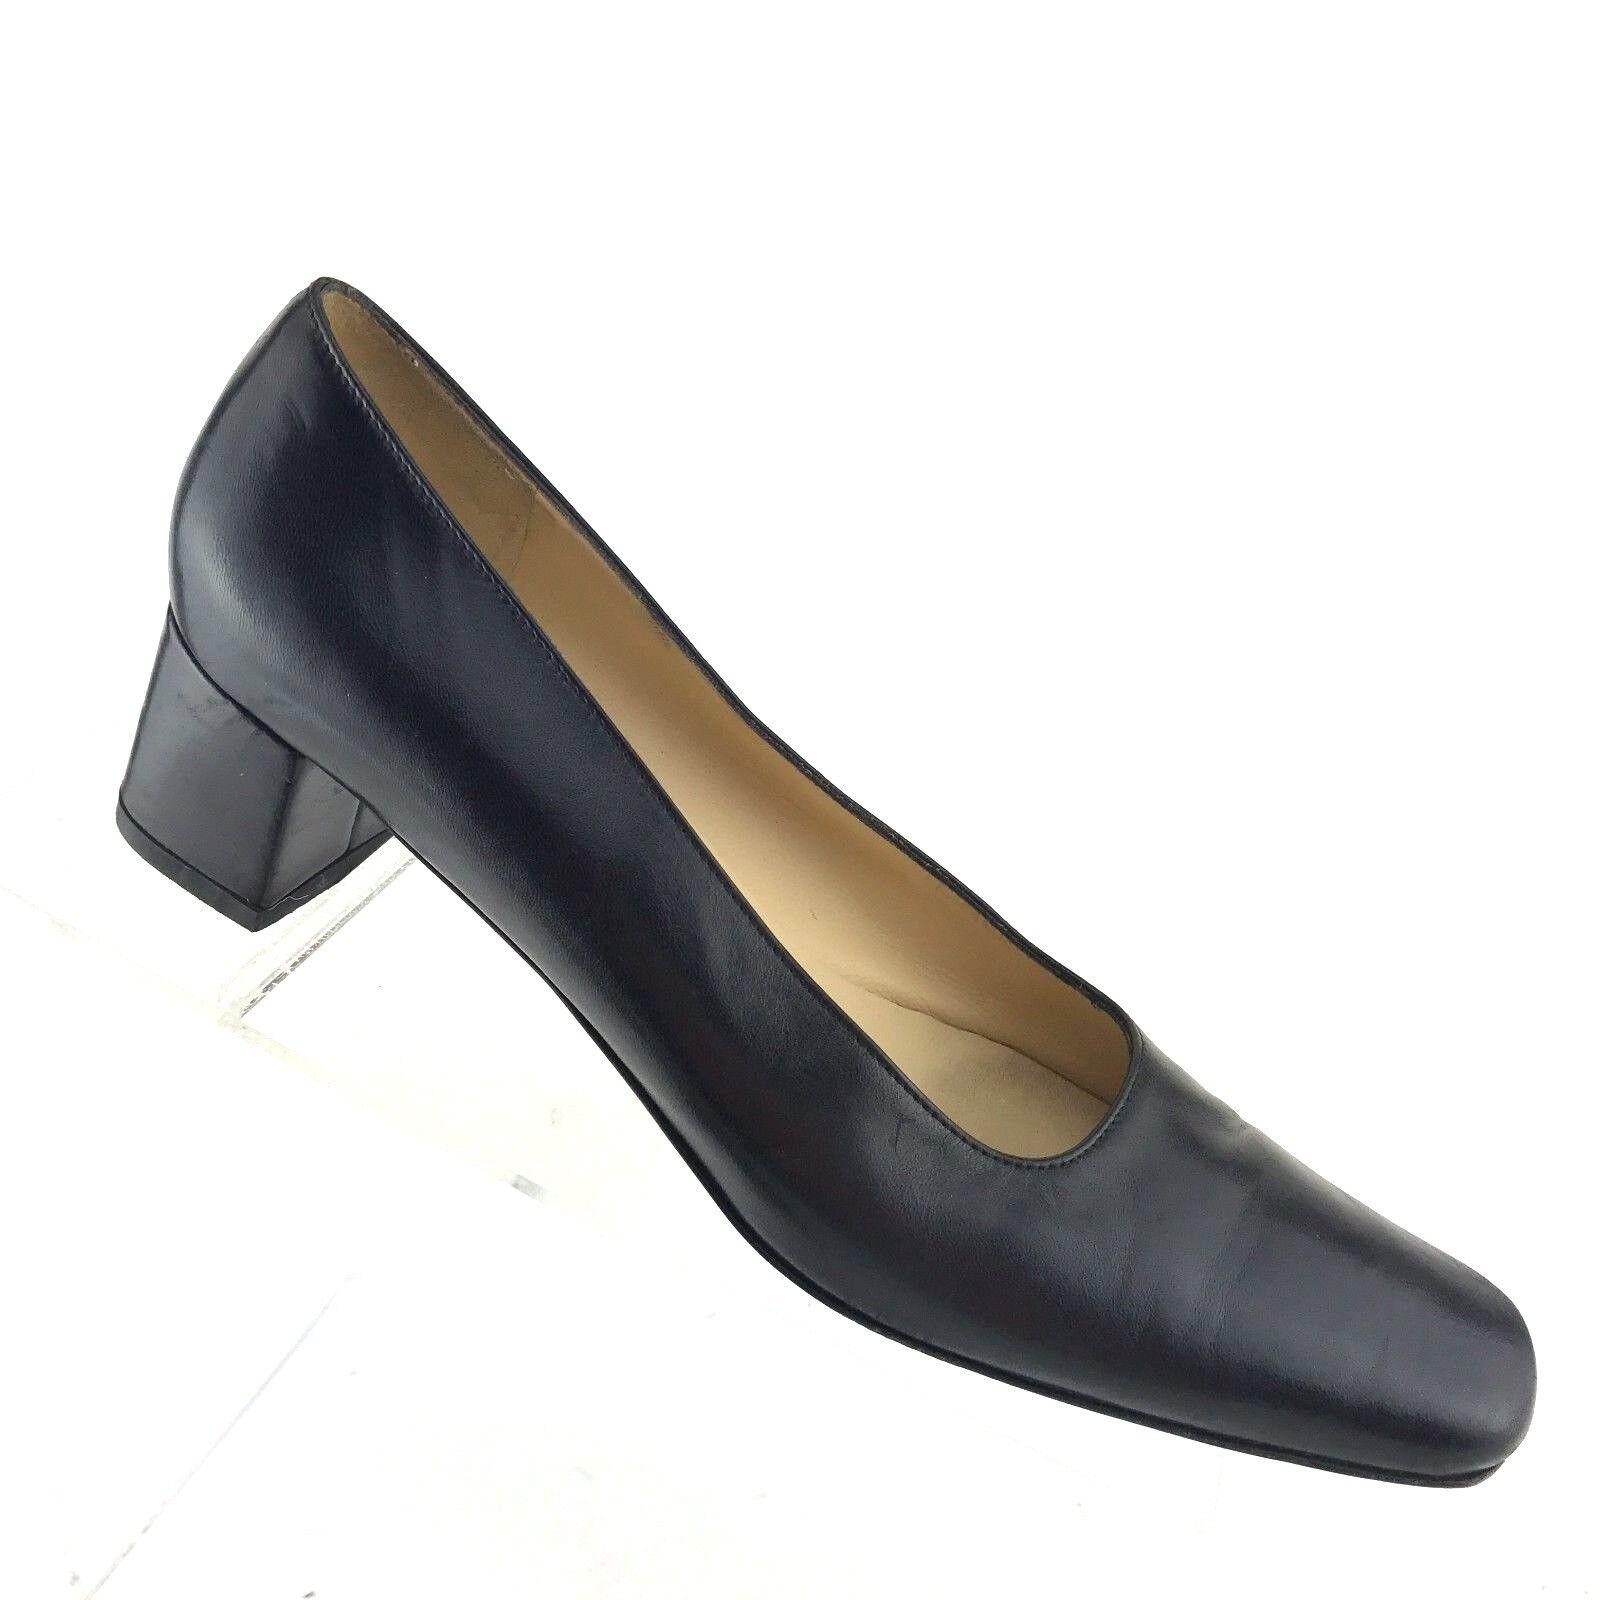 Salvatore Ferragamo Boutique Black Leather Block Heels Womens Shoe SIZE 7 AAA